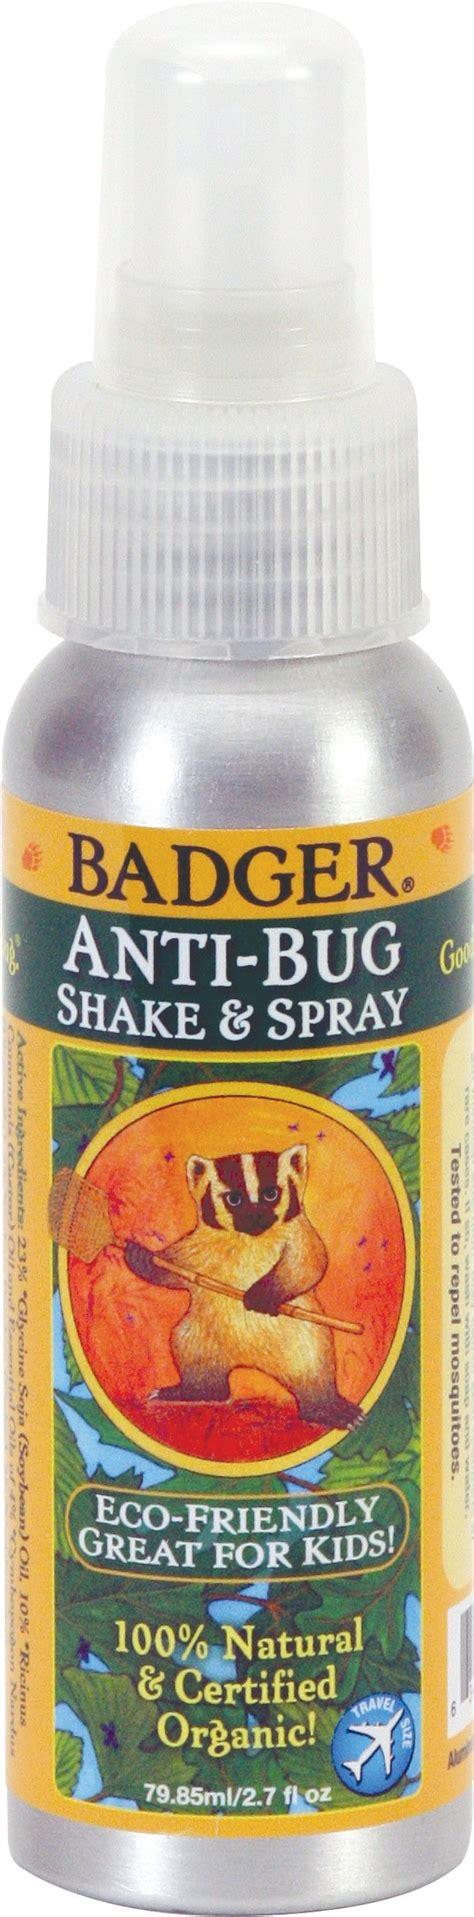 Badger 100 Organic Anti Bug Shake Spray 1183 Ml badger balm anti bug balm stick 1 5 oz